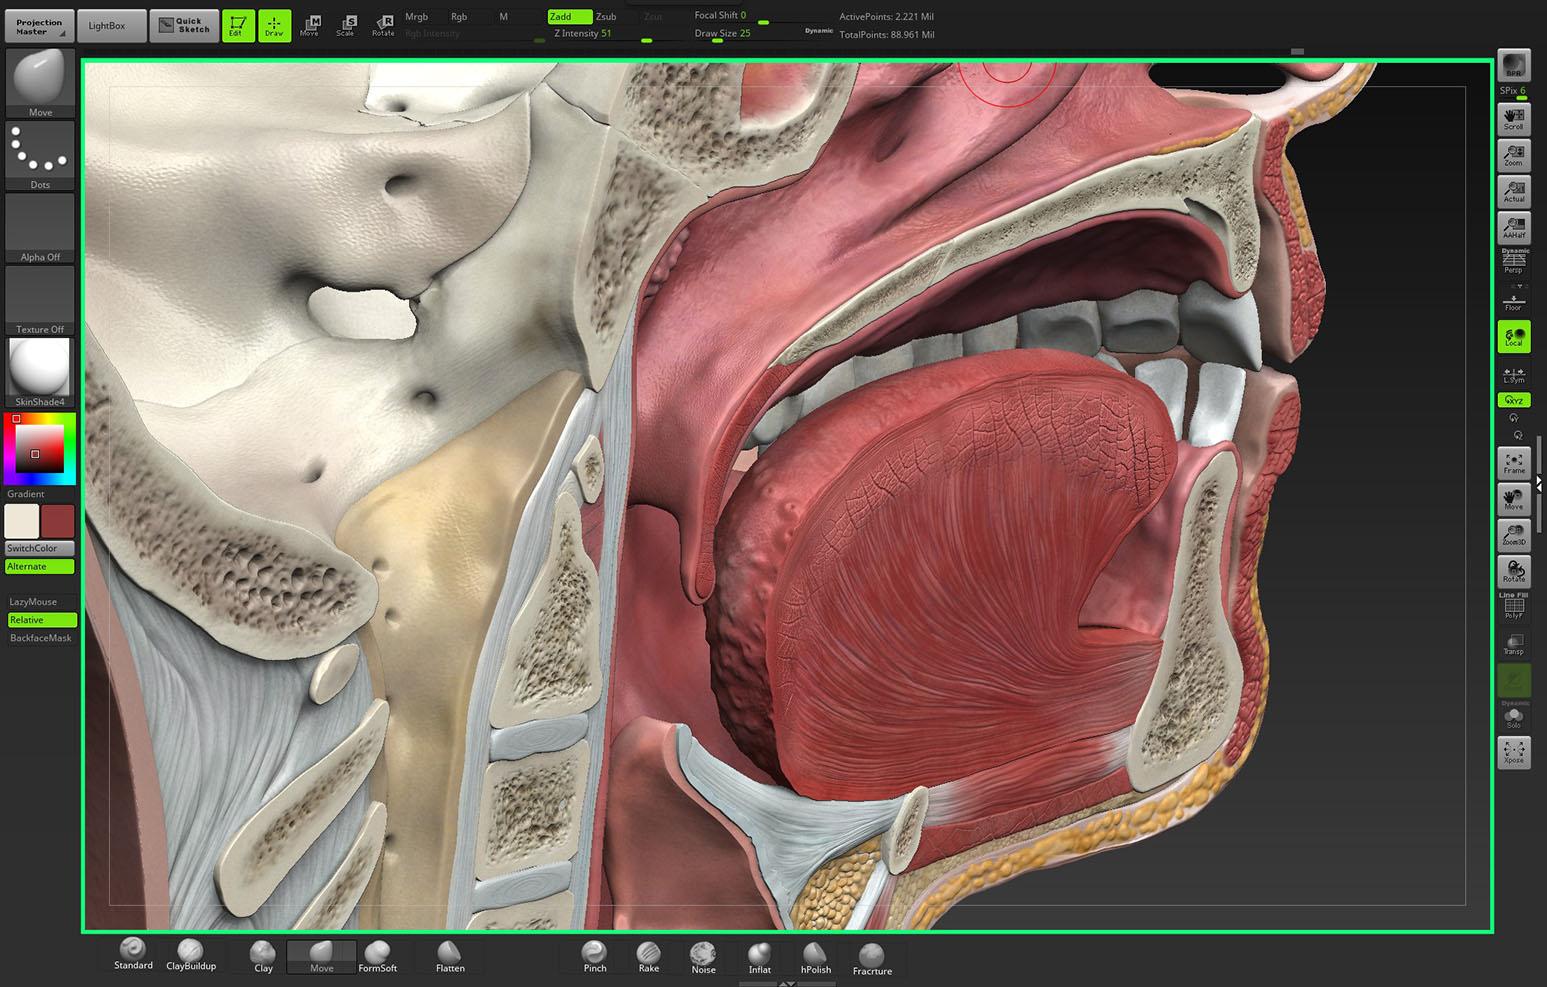 INTERVOKE: Interactive Software   Educational Videos   Patient Education